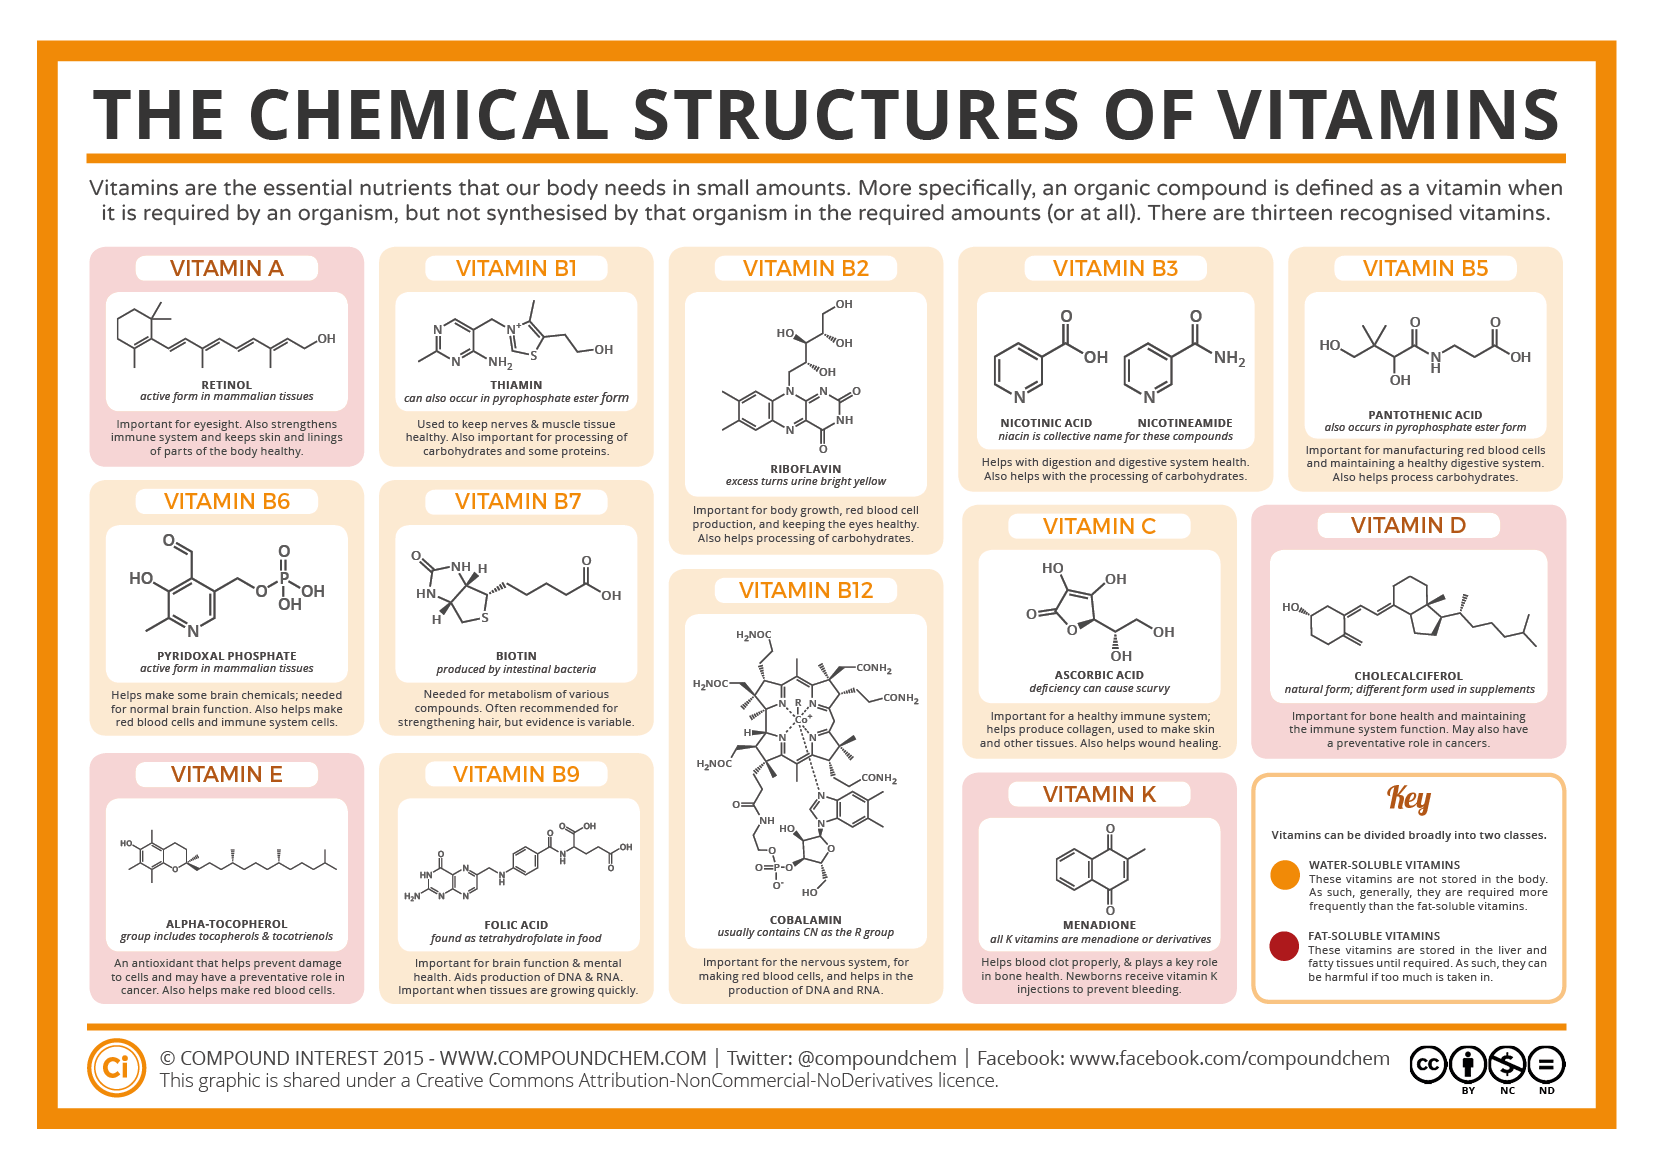 Vitamin E is a water soluble vitamin